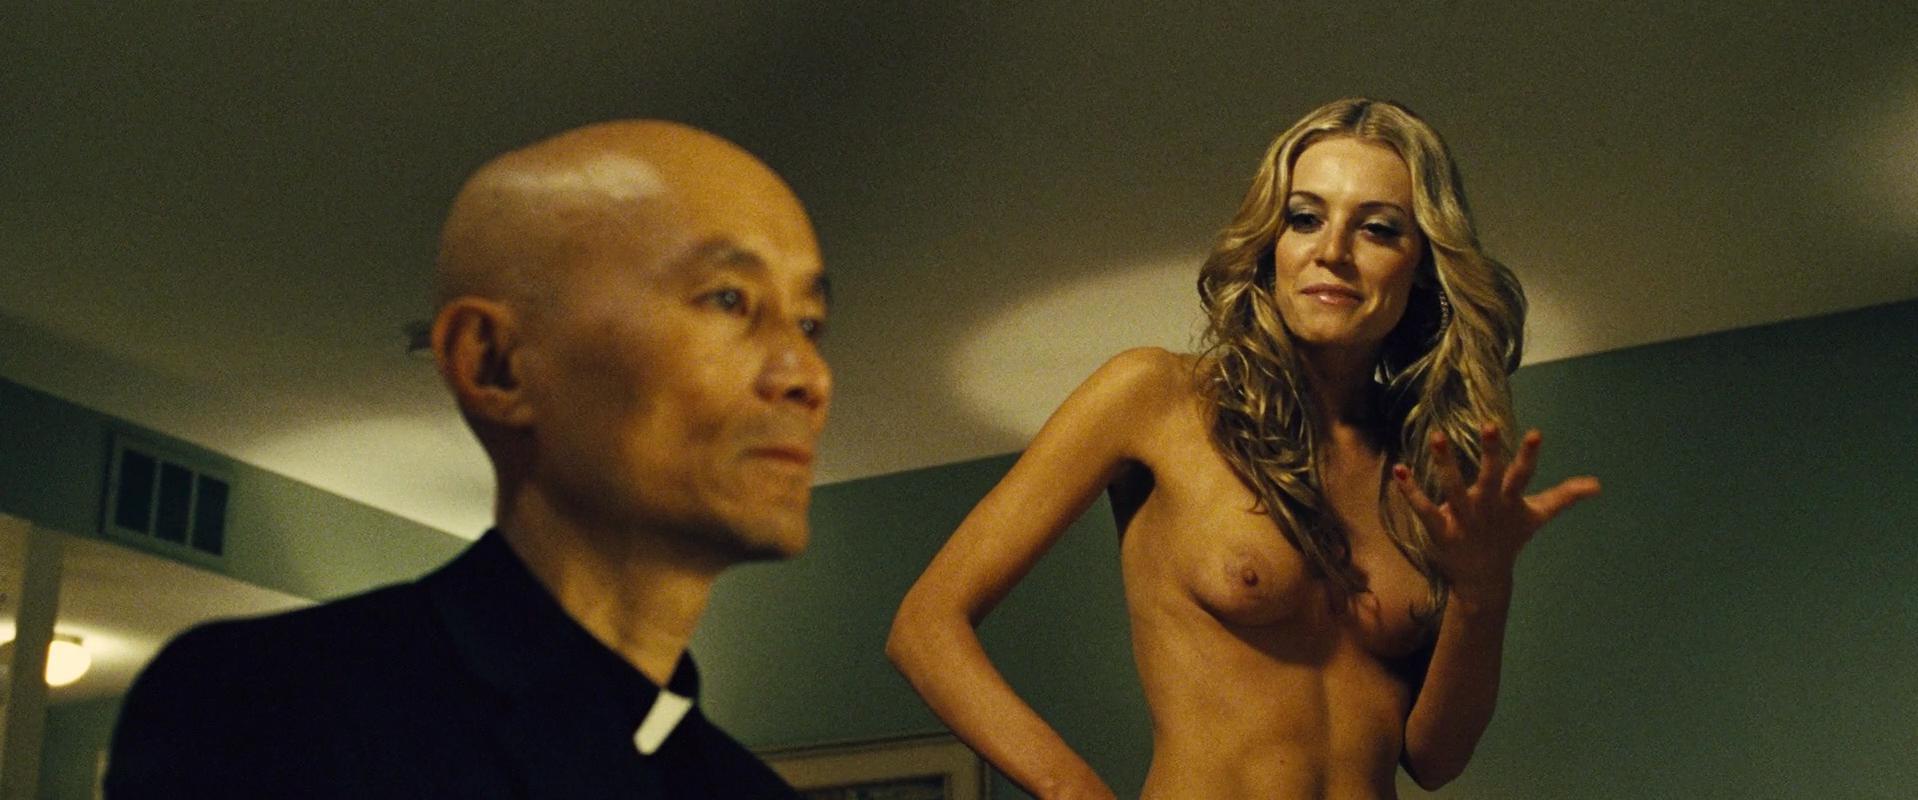 Angela Covello Nude nude video celebs » christine marzano nude - seven